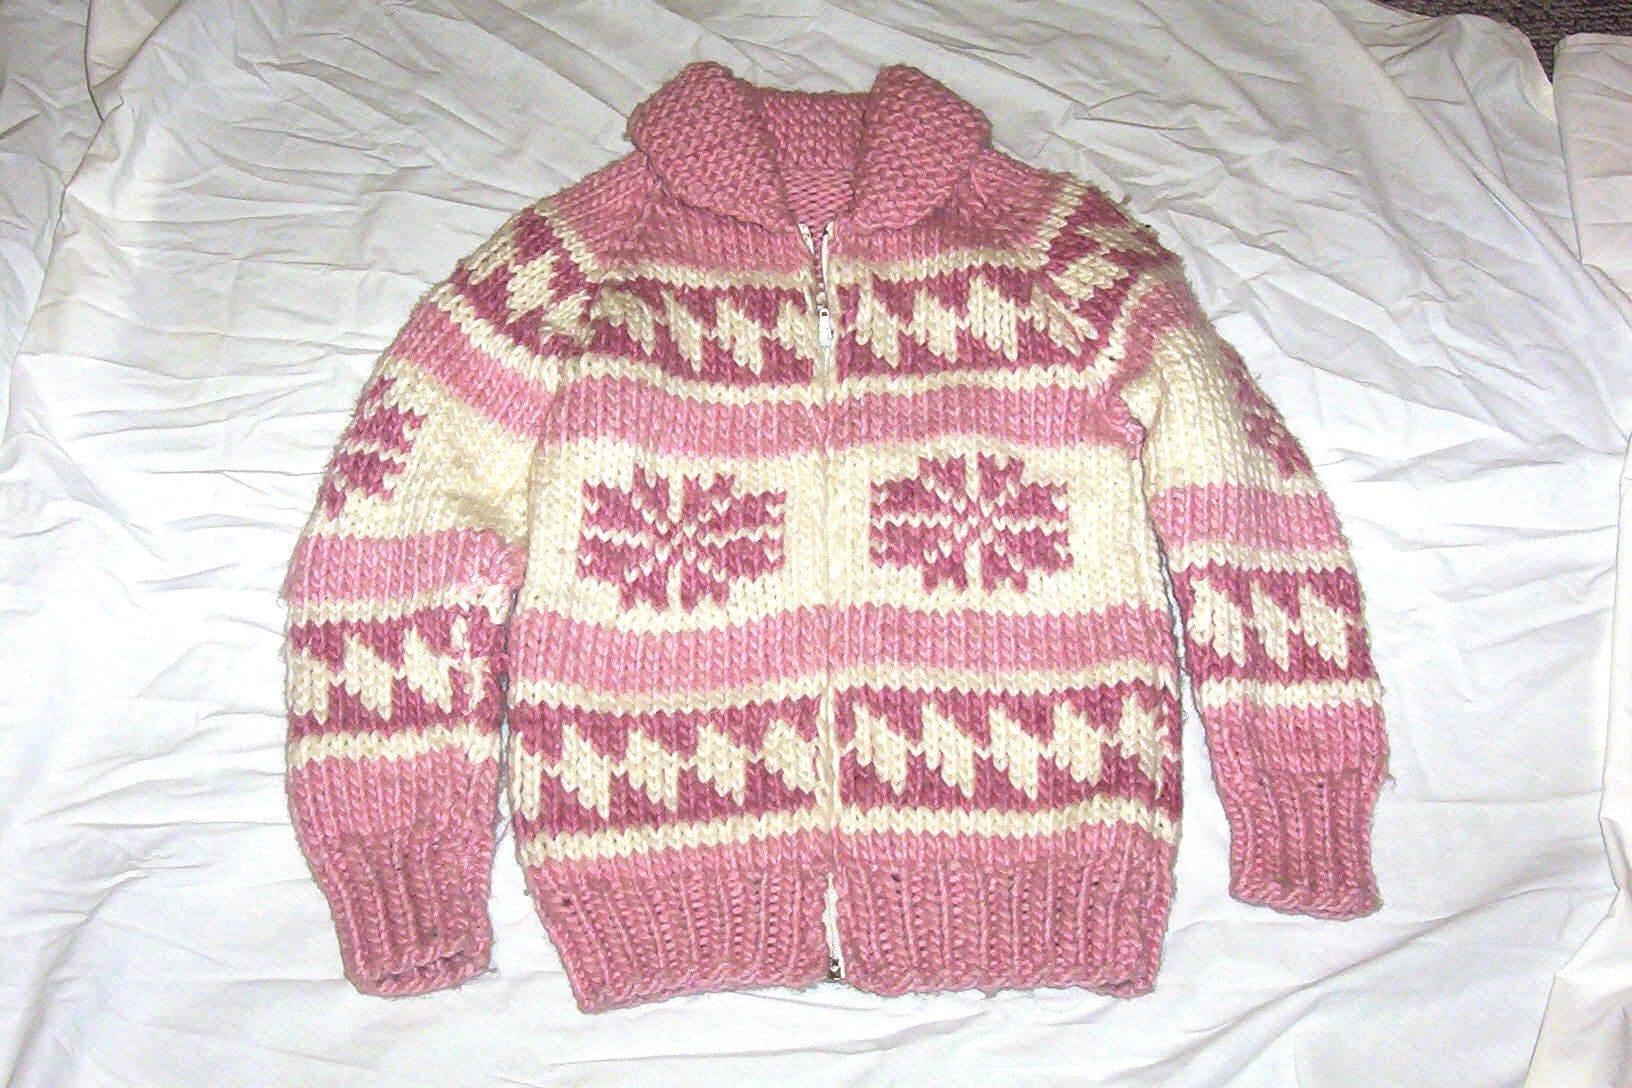 Vintage Hand Knit Cowichan Sweater Jacket